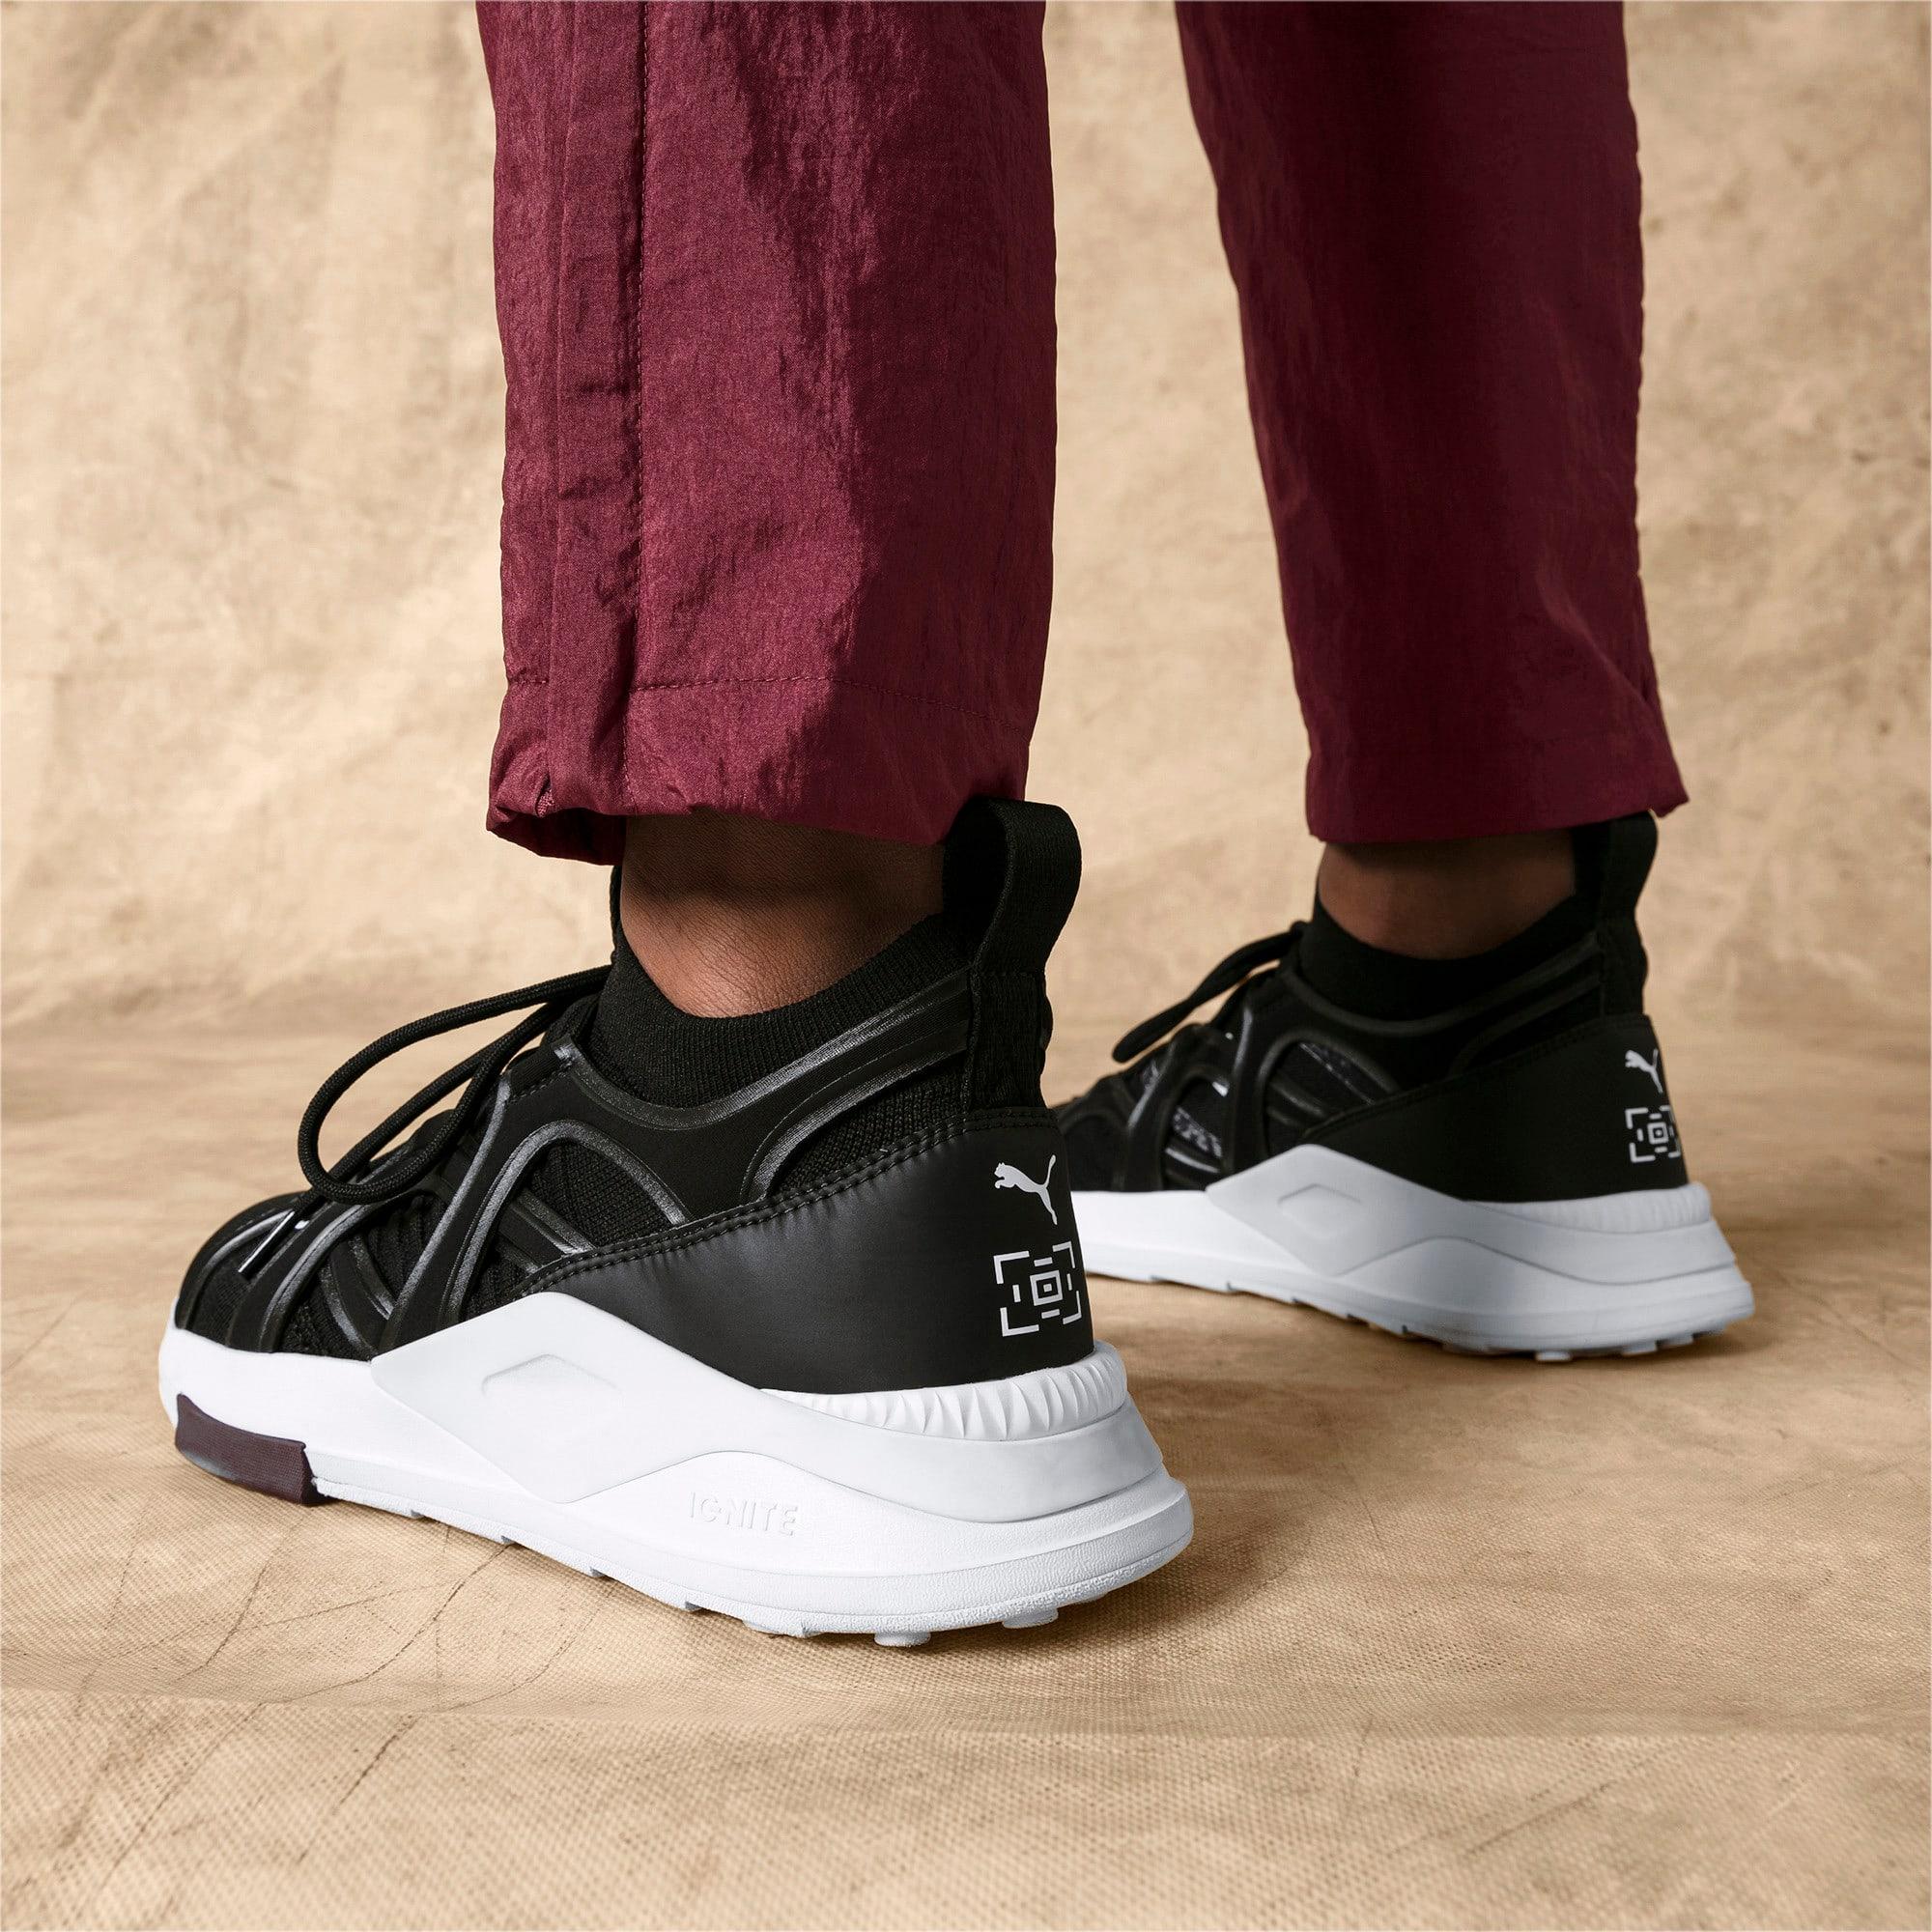 Thumbnail 3 of SHOKU LES BENJAMINS Sneakers, Puma Black, medium